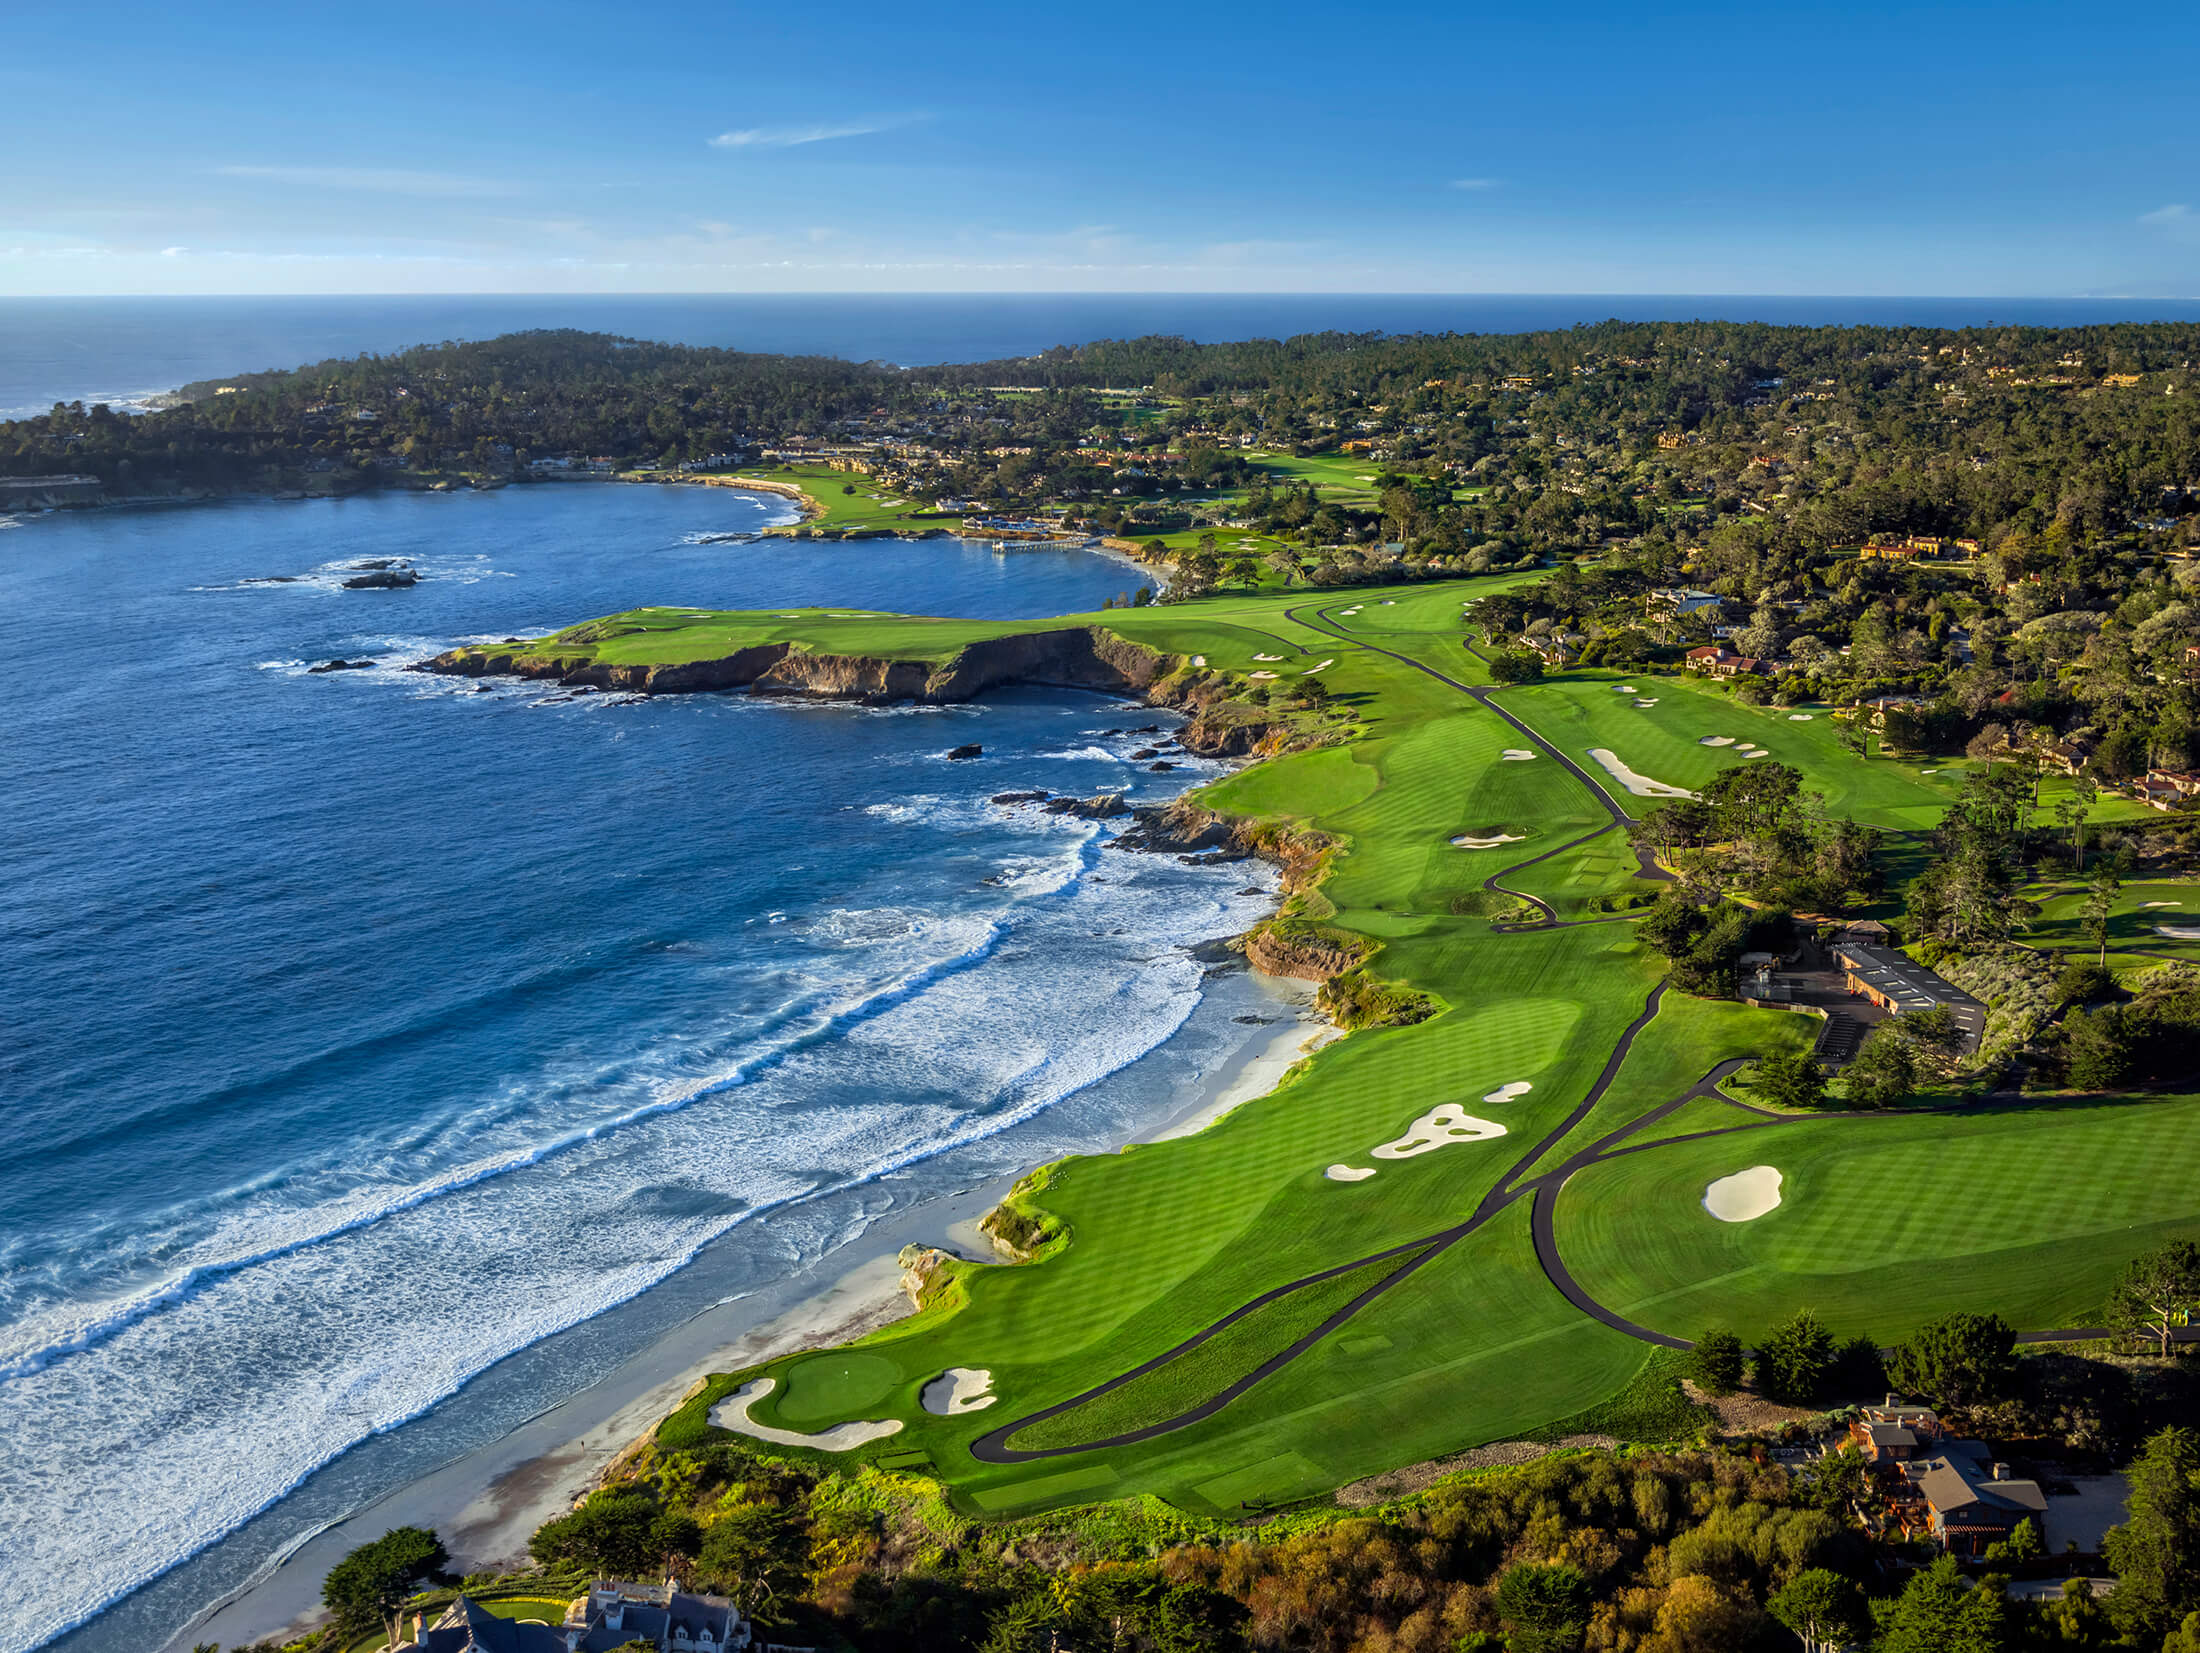 Pebble Beach Resorts | Golf Resorts, Courses & Spa Vacations